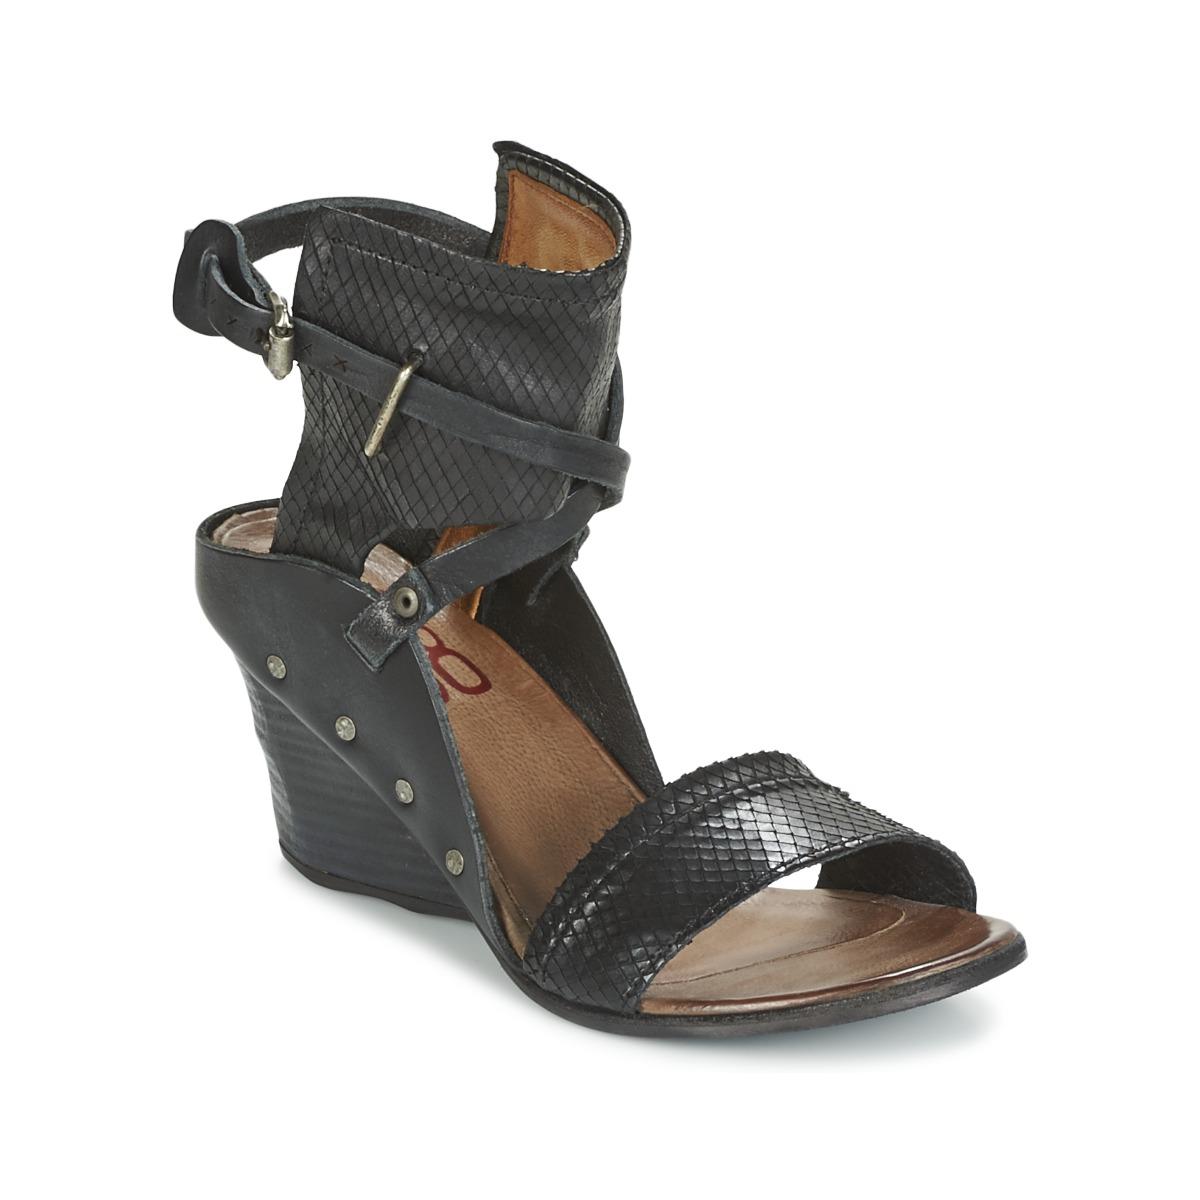 Sandale Airstep / A.S.98 KOKKA Noir